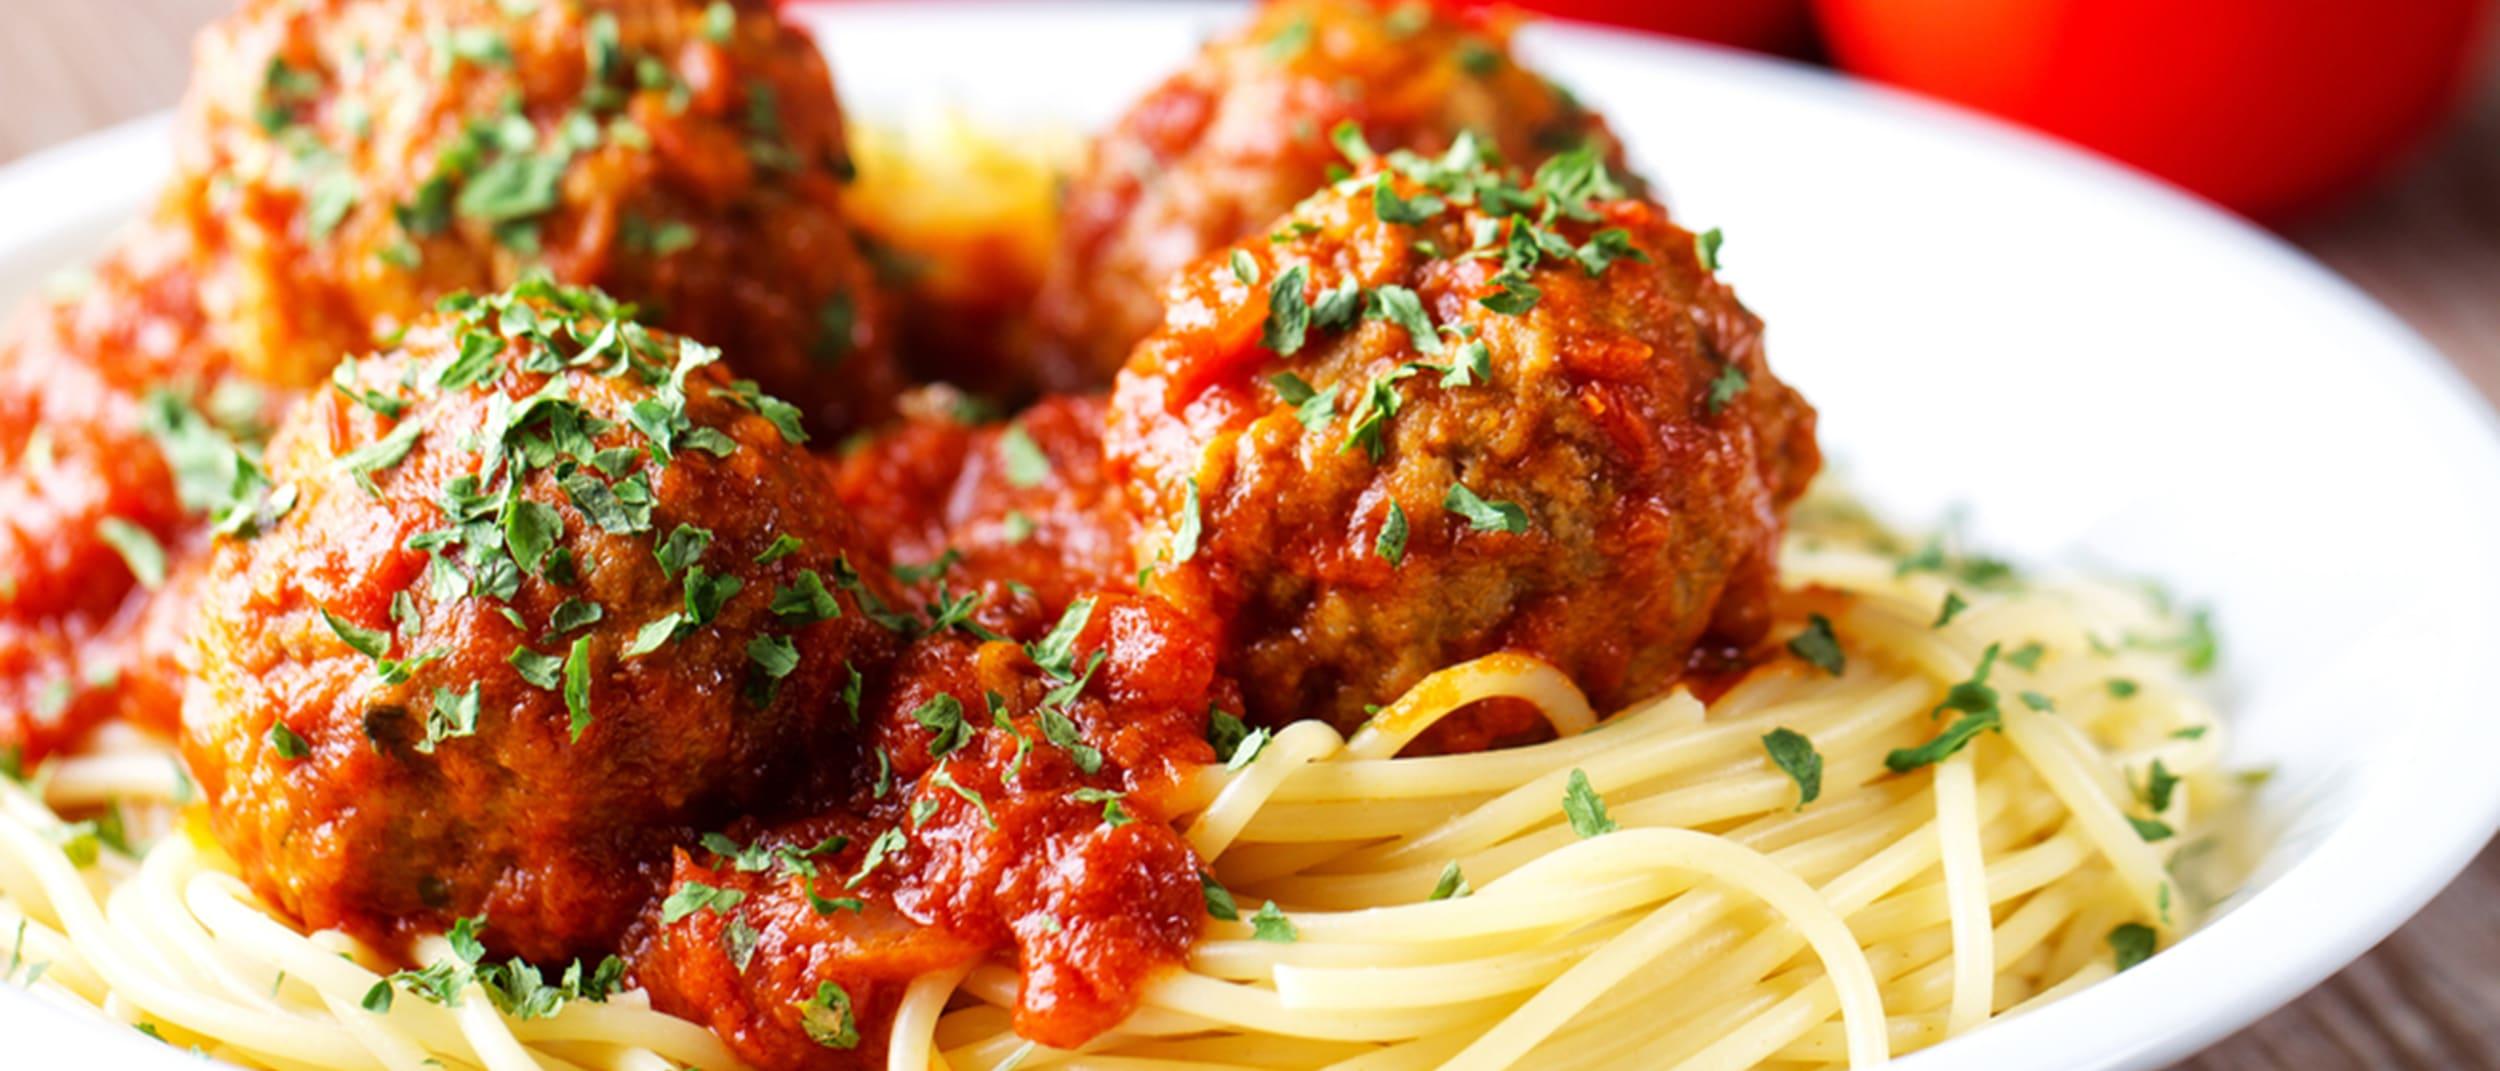 Saville's Butchery: italian meatballs deal